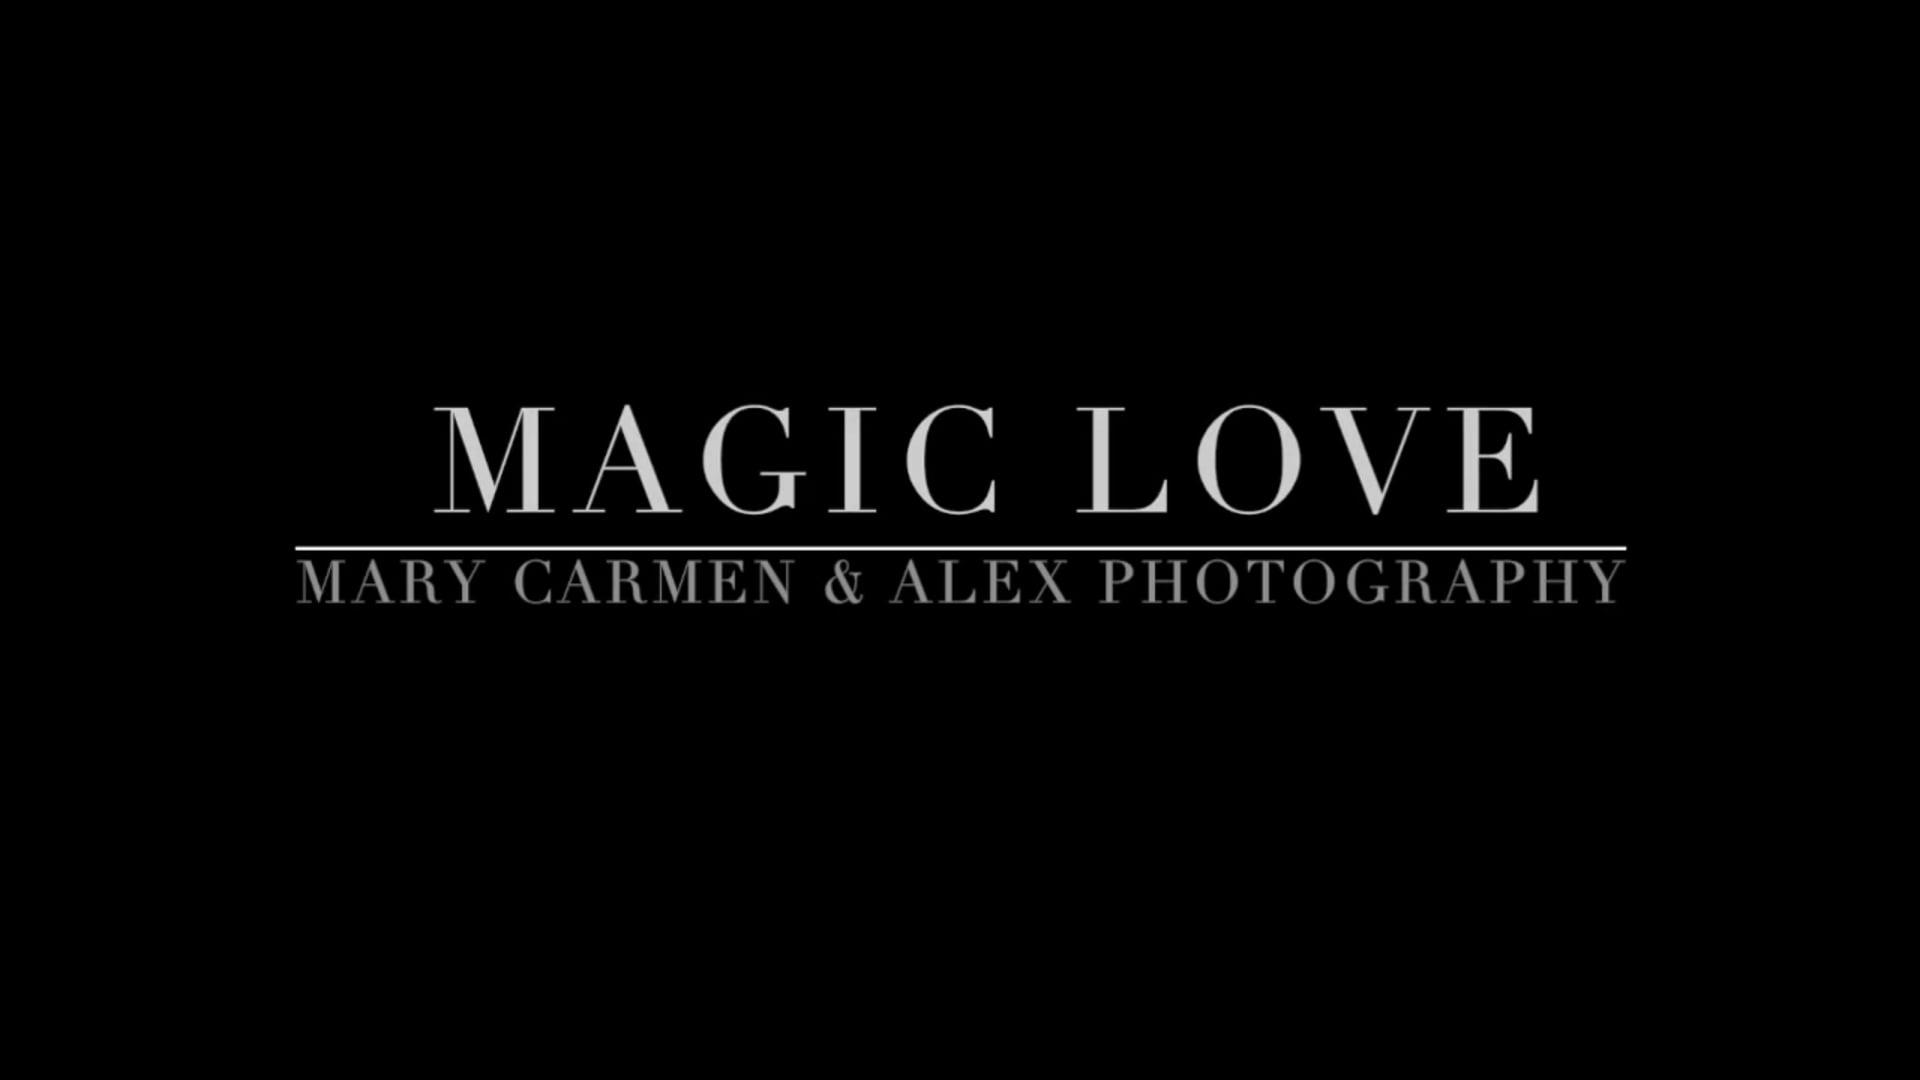 Magic love Promo